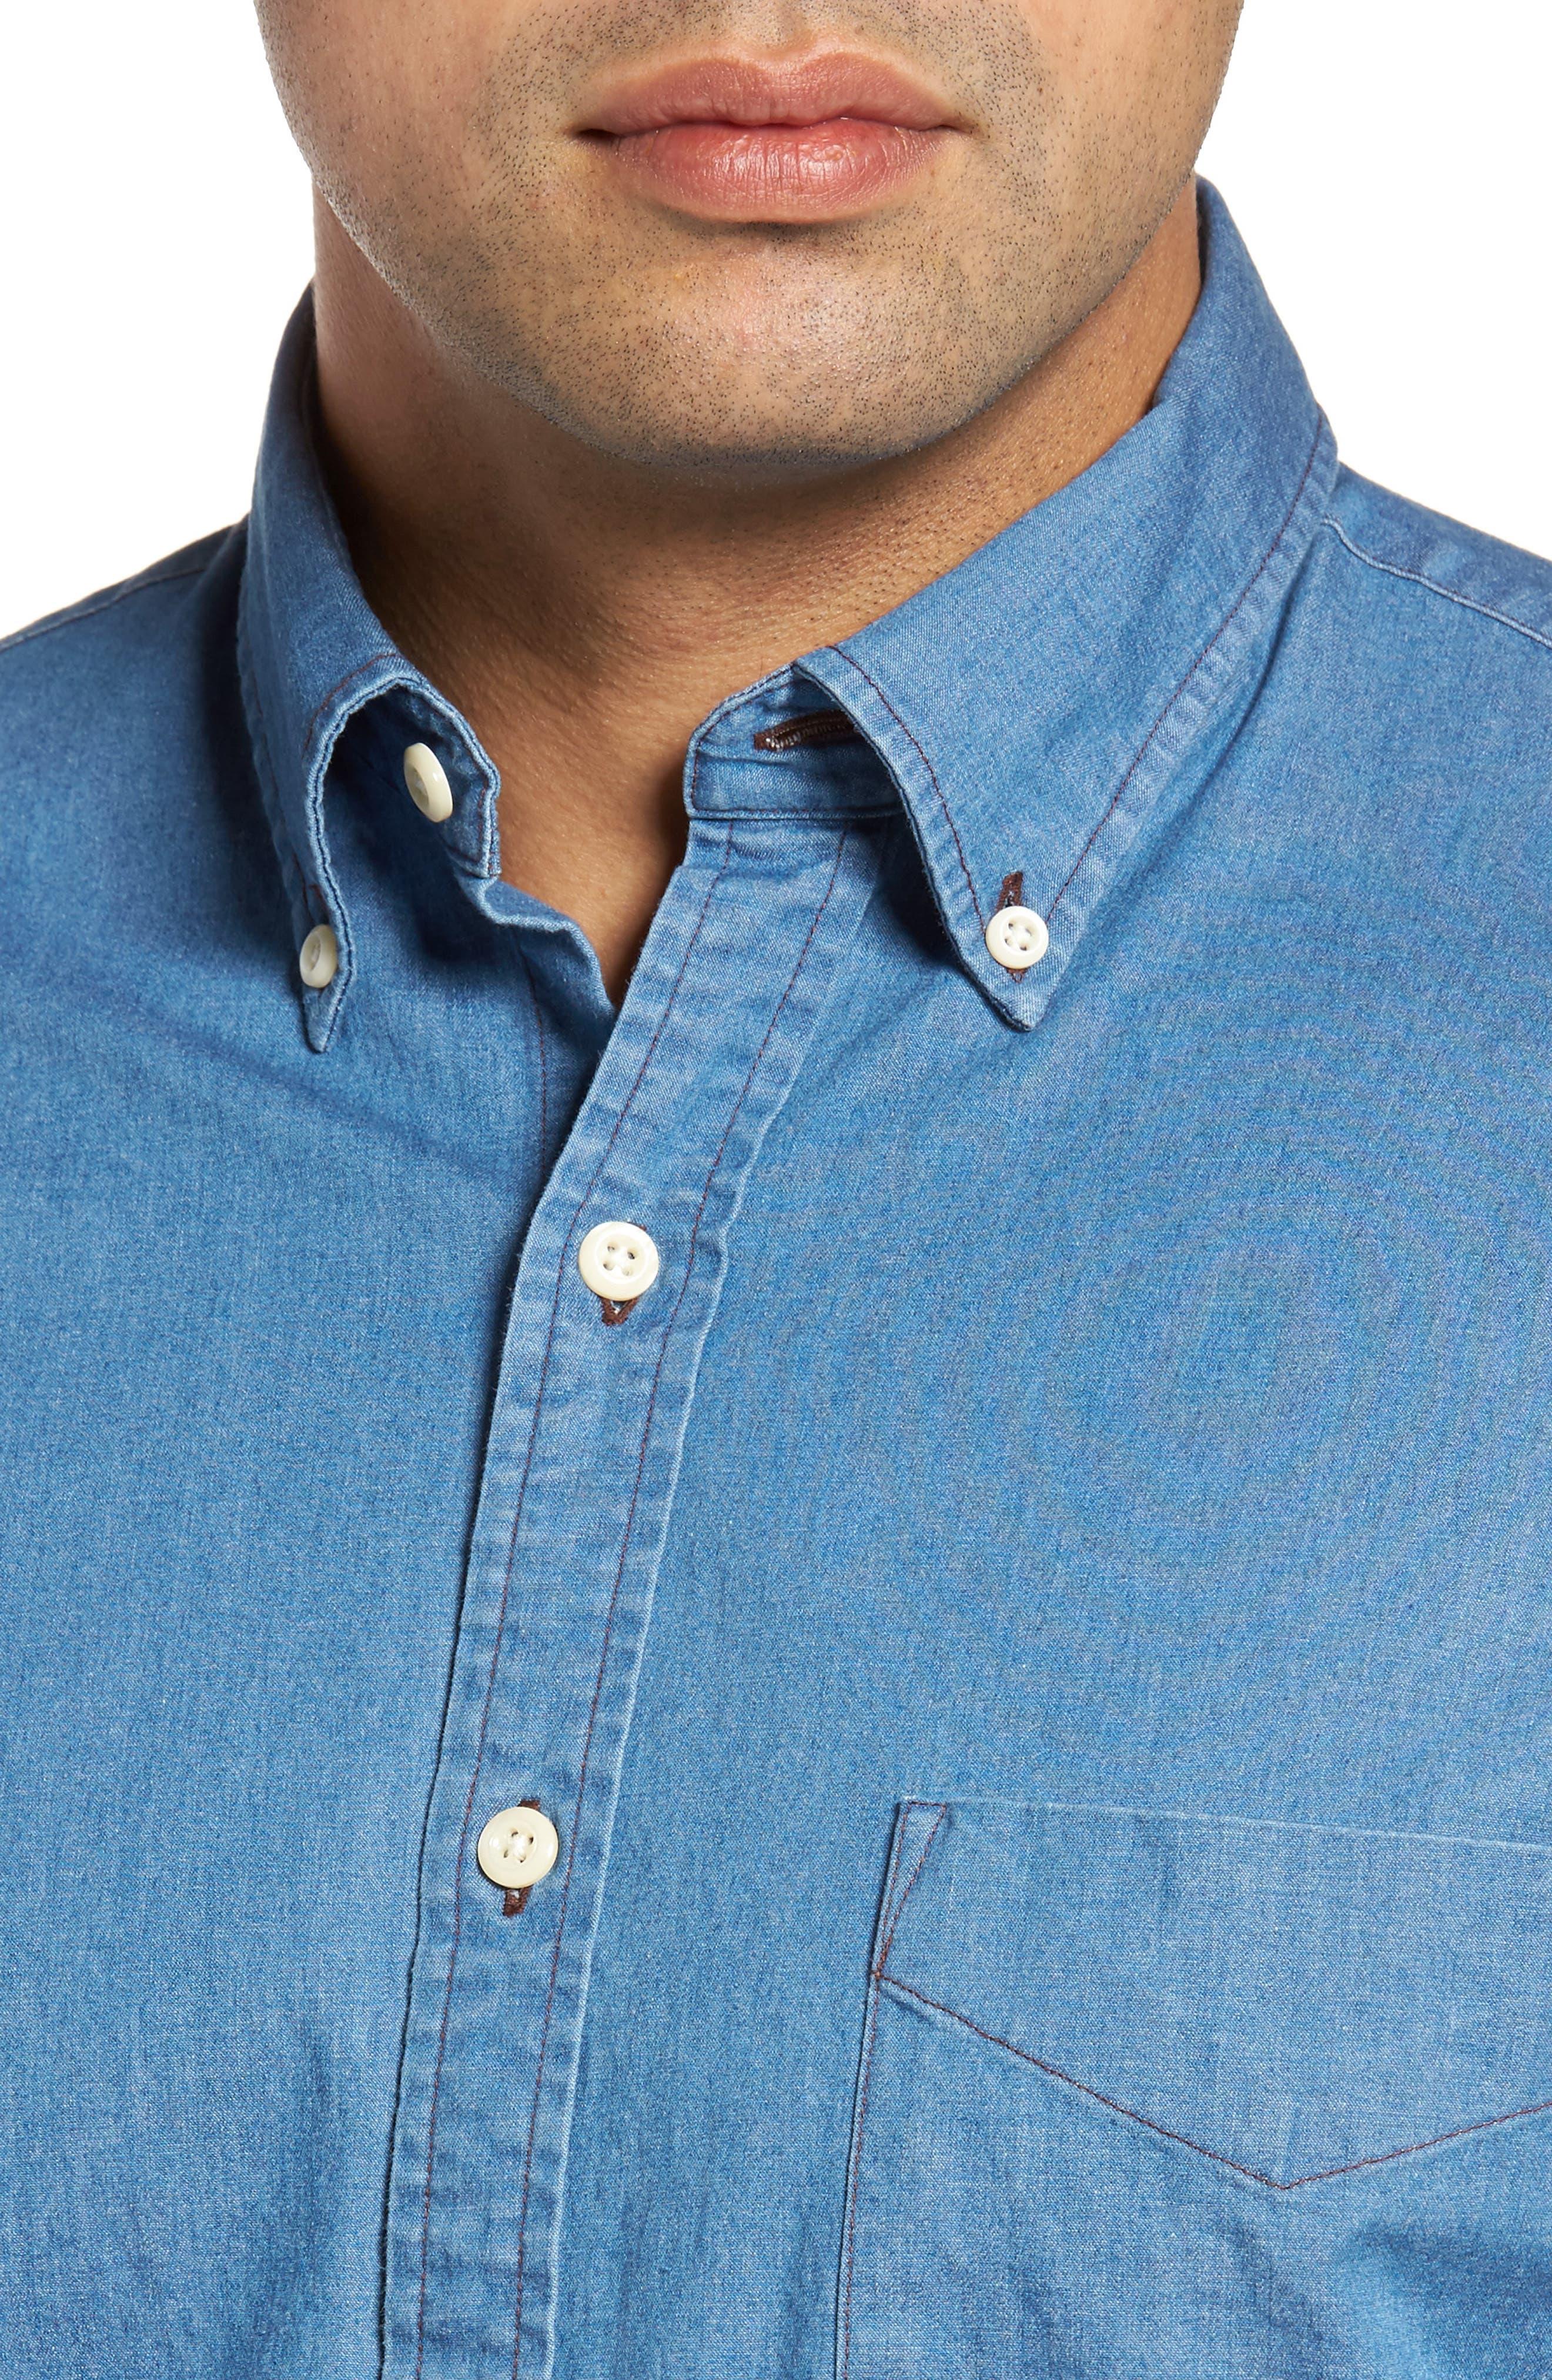 Crown Vintage Regular Fit Denim Sport Shirt,                             Alternate thumbnail 4, color,                             Indigo